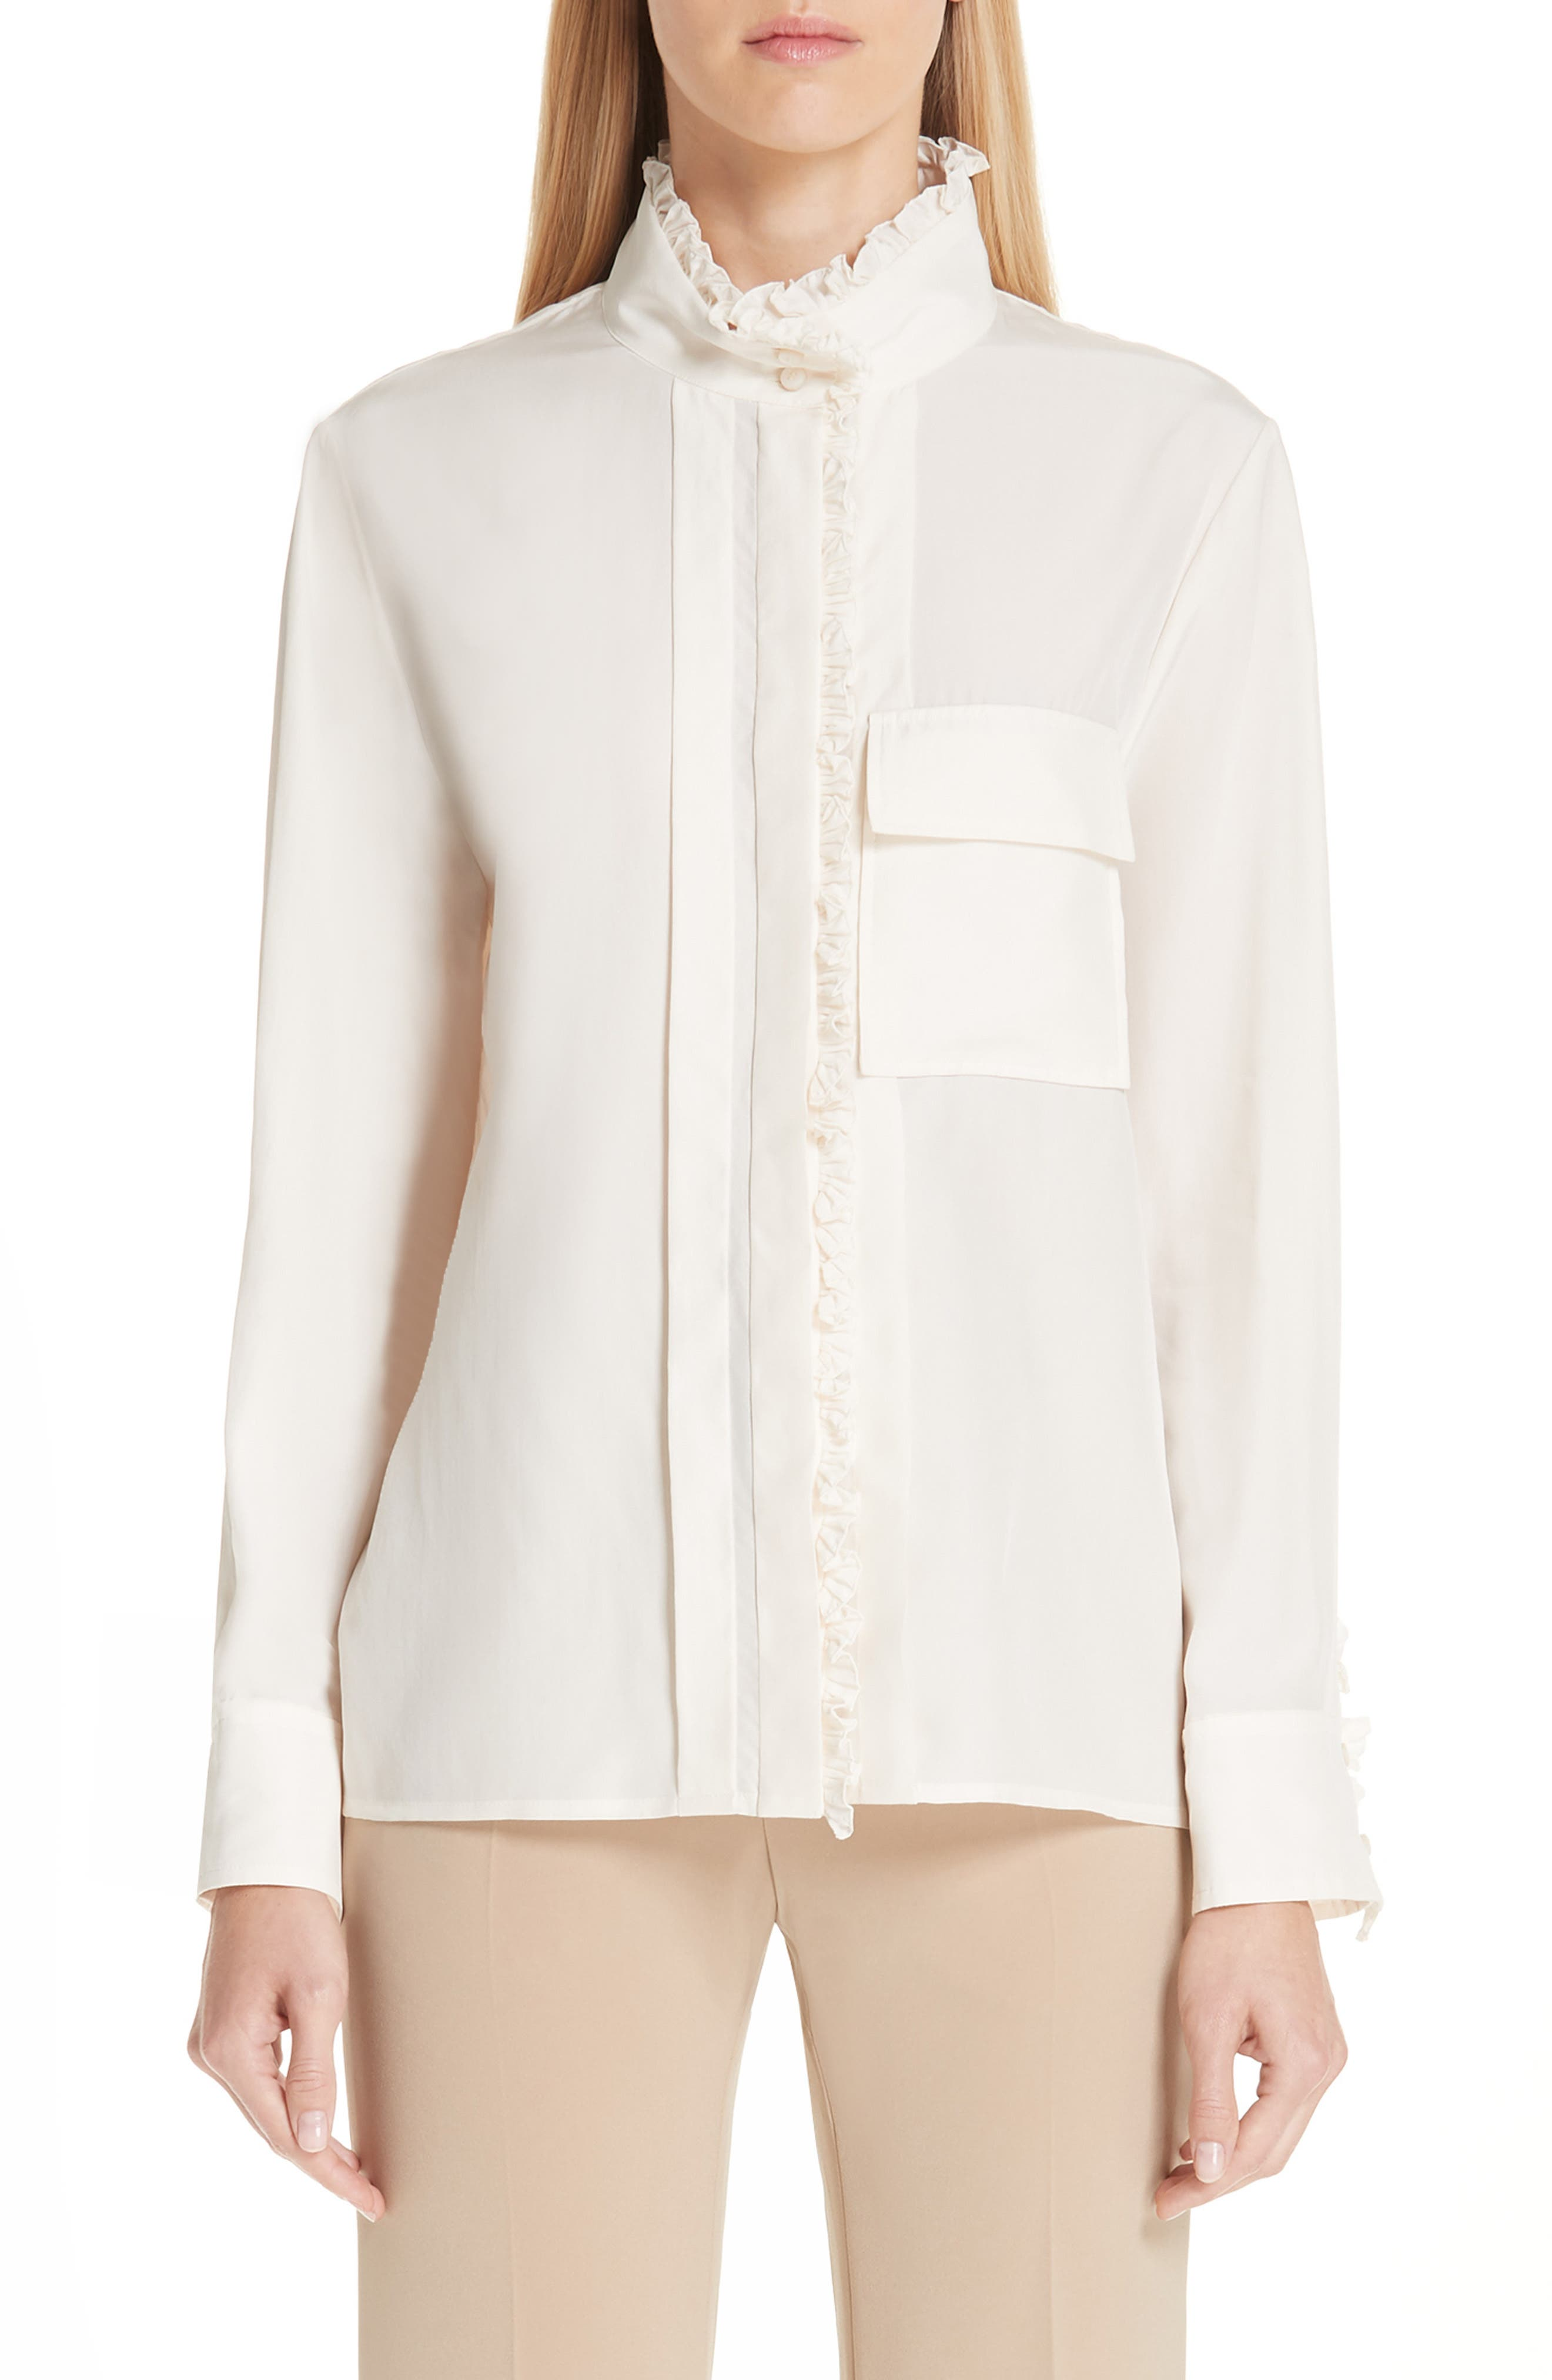 0f59896f1293b5 chloe shirts tops for women - Buy best women's chloe shirts tops on ...